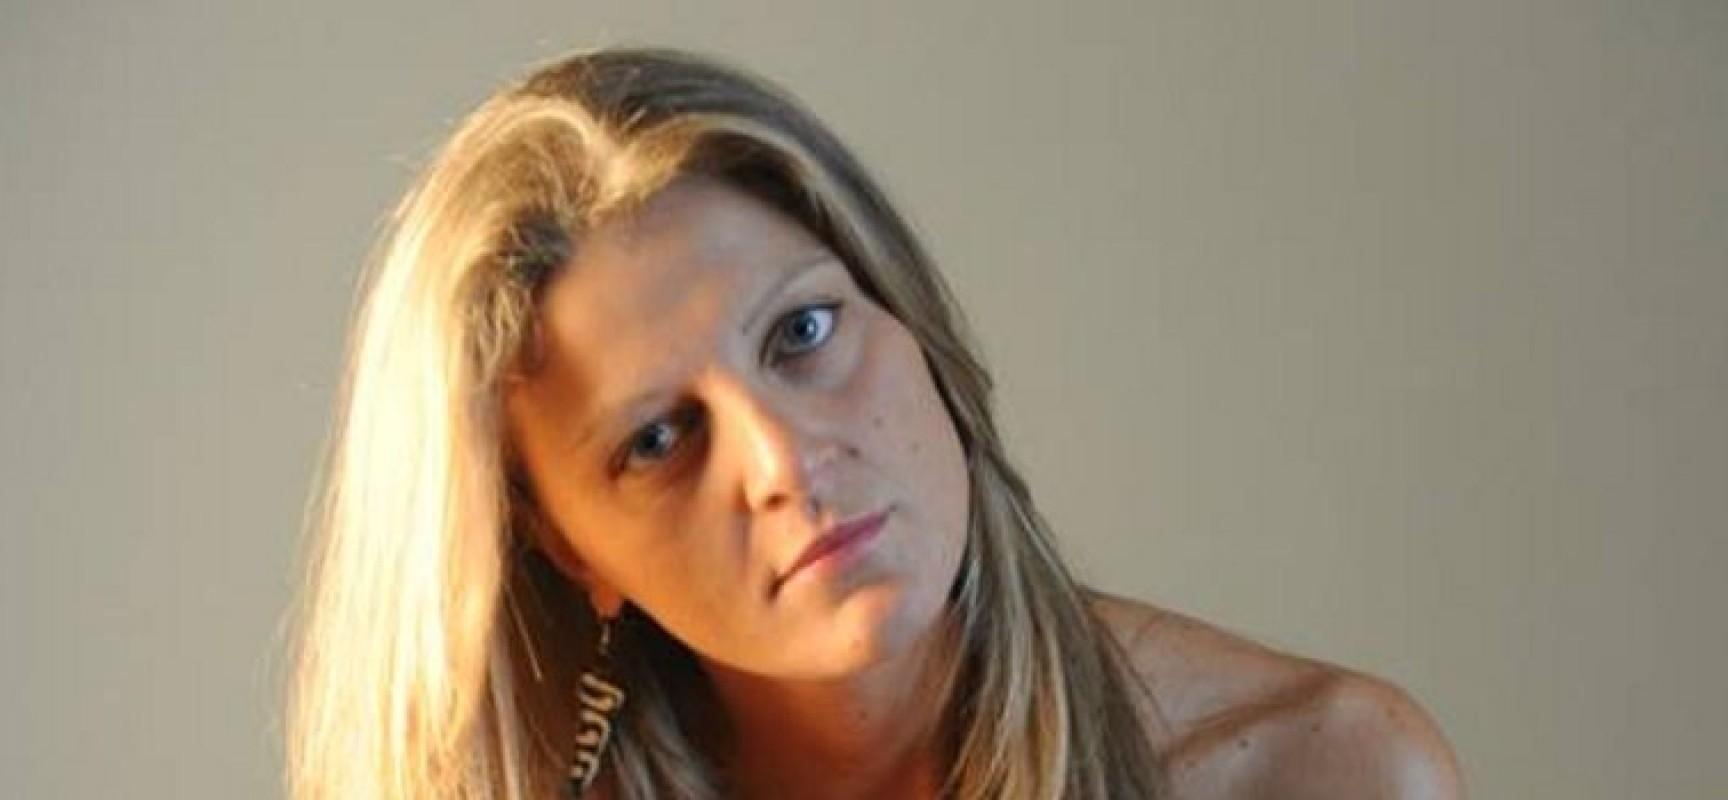 Bianca Lopez in concerto in Piazza Vittorio Emanuele stasera 27 agosto